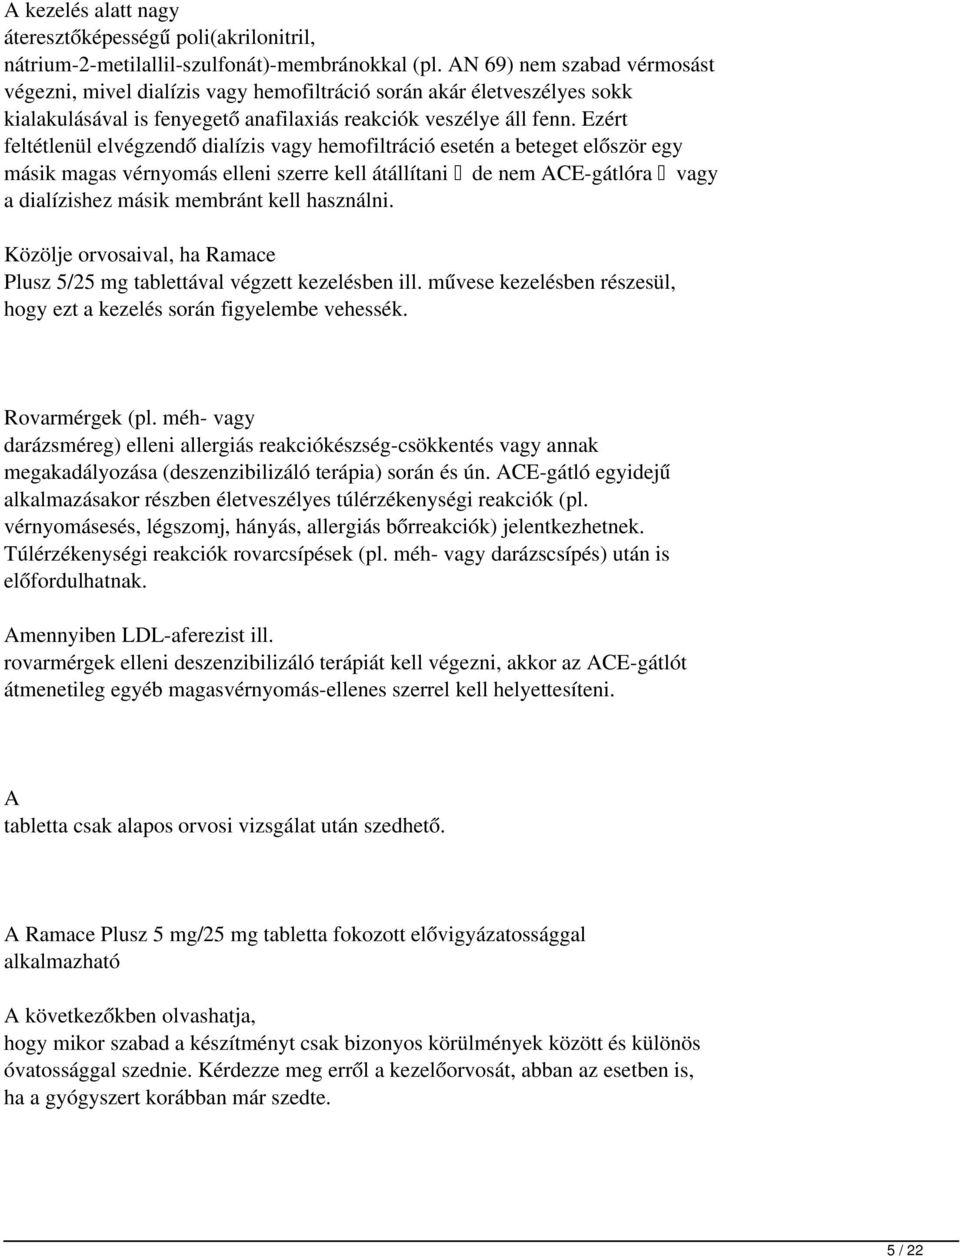 nátrium-klorid magas vérnyomás esetén)